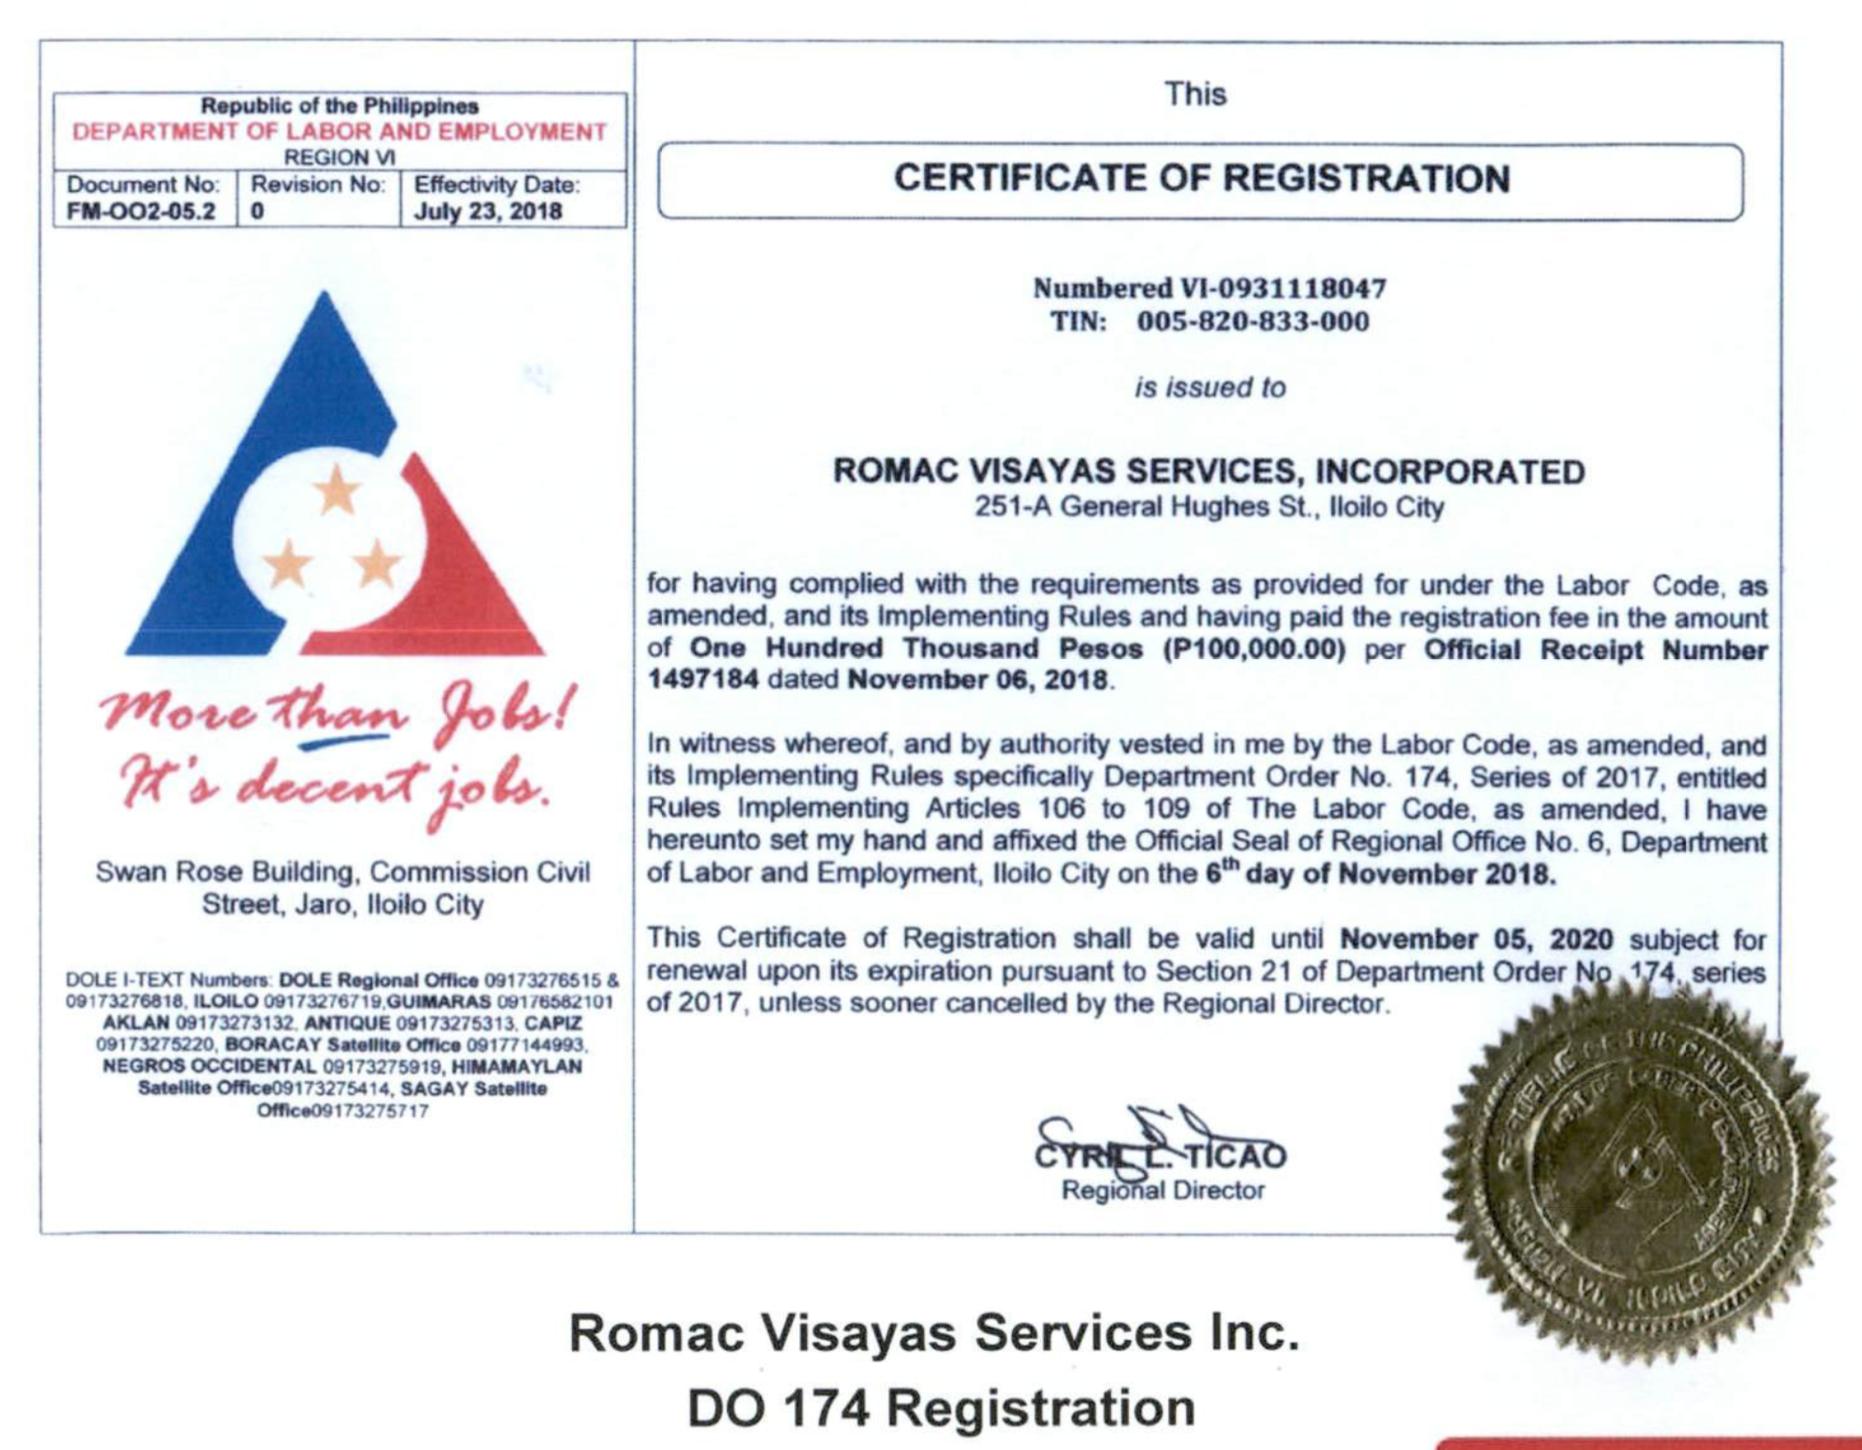 Romac Visayas Services Inc. DO 174 Registration